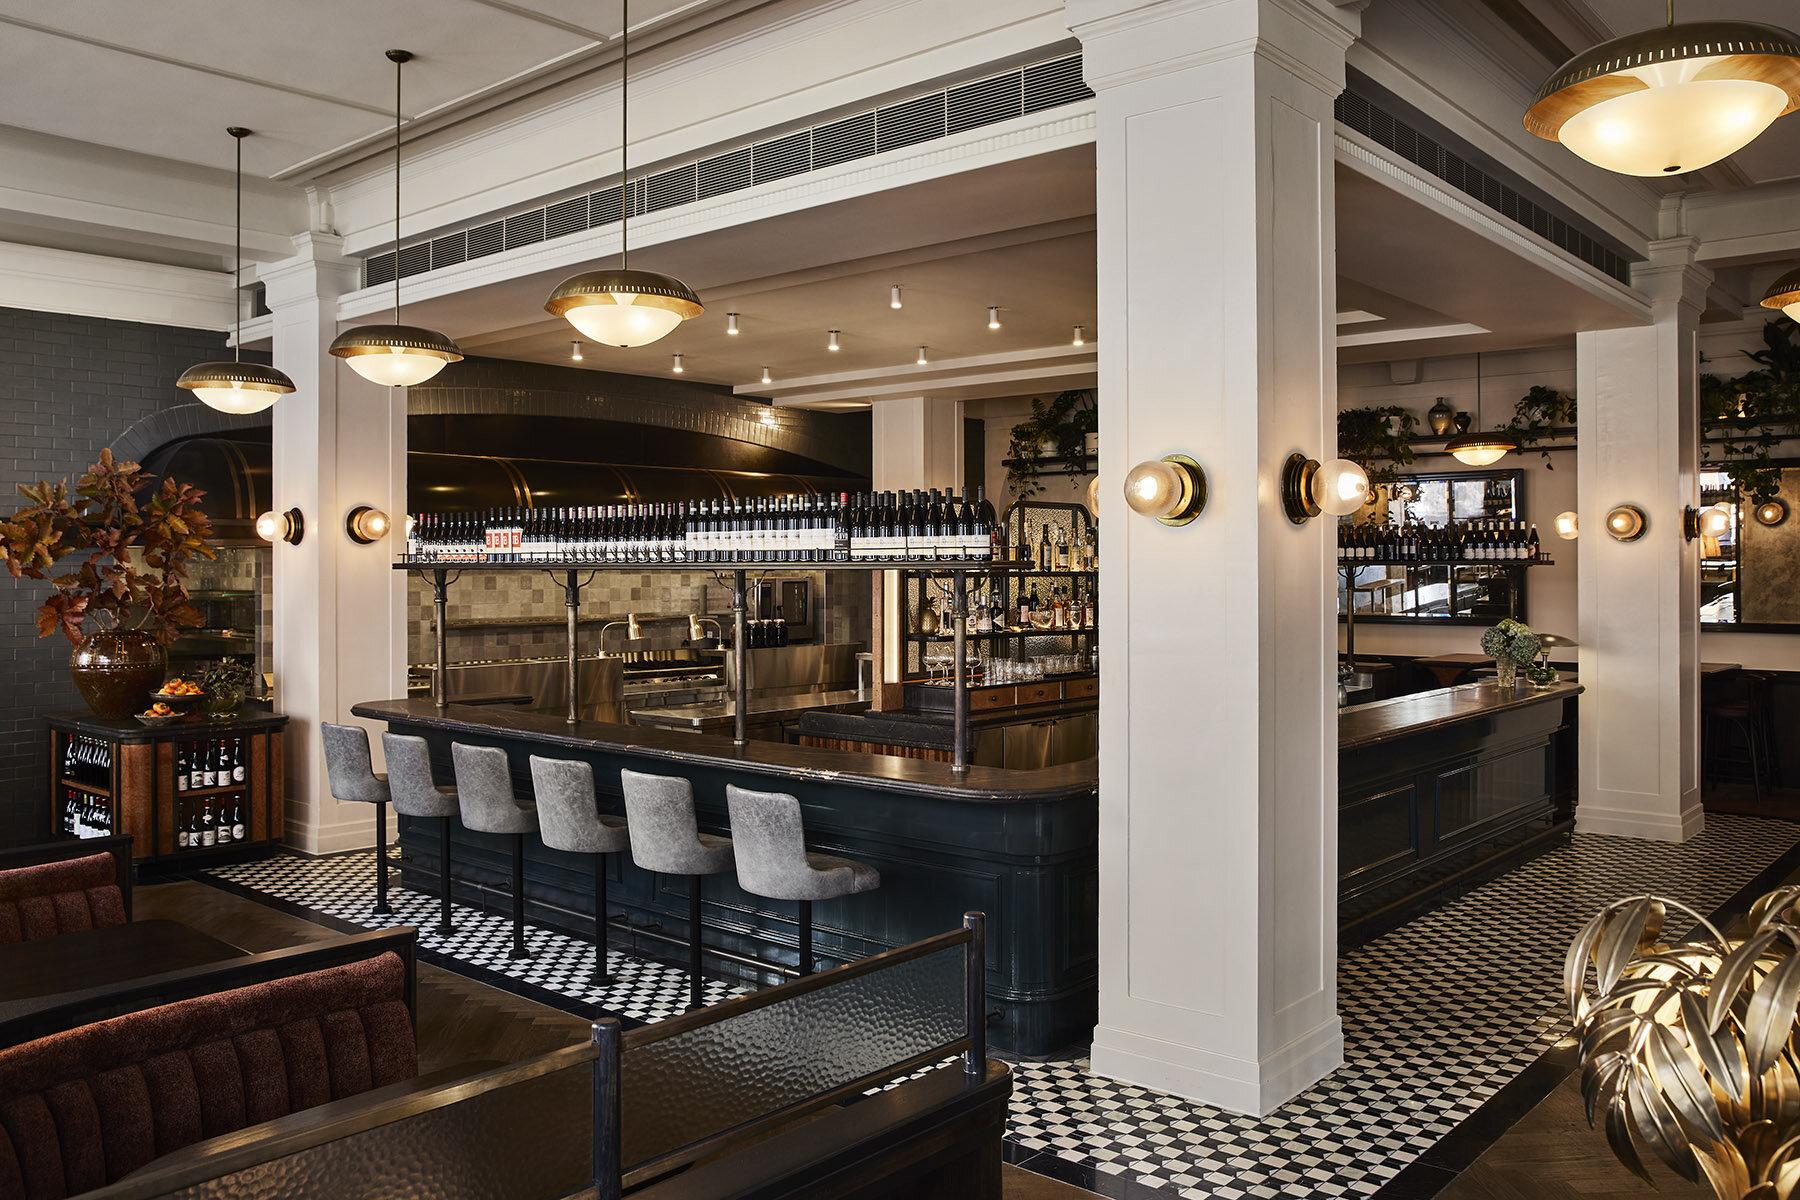 Sydney Interior Designers: The Top 10 Modern Chairs Inspirations sydney interior designers Sydney Interior Designers: The Top 10 Modern Chairs Inspirations Interior Designers in Sydney ACME